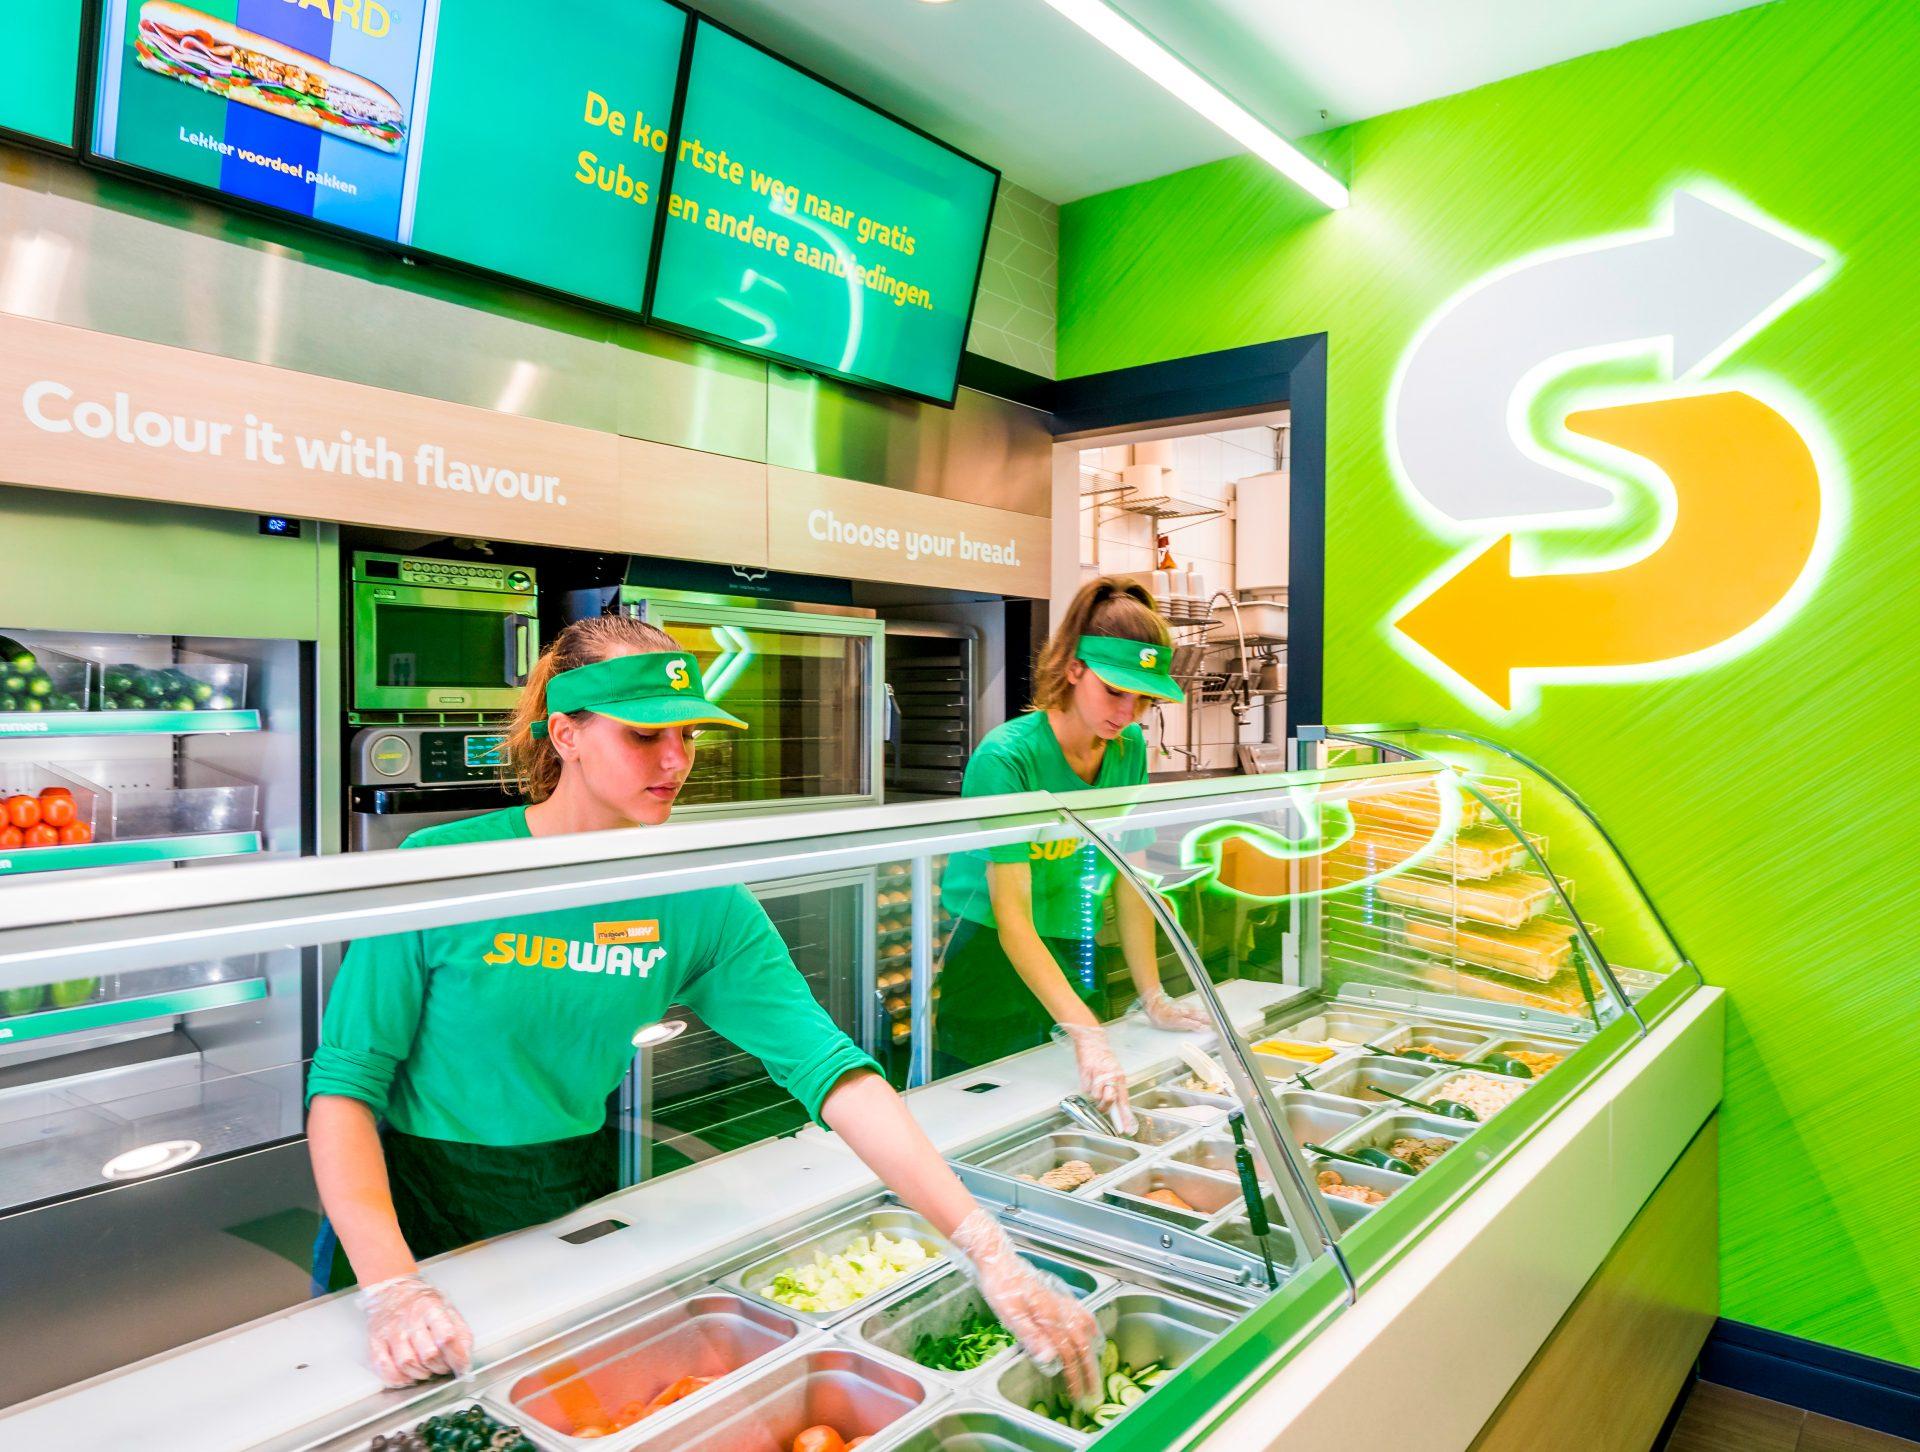 Subway zoekt franchisenemers in Amersfoort!